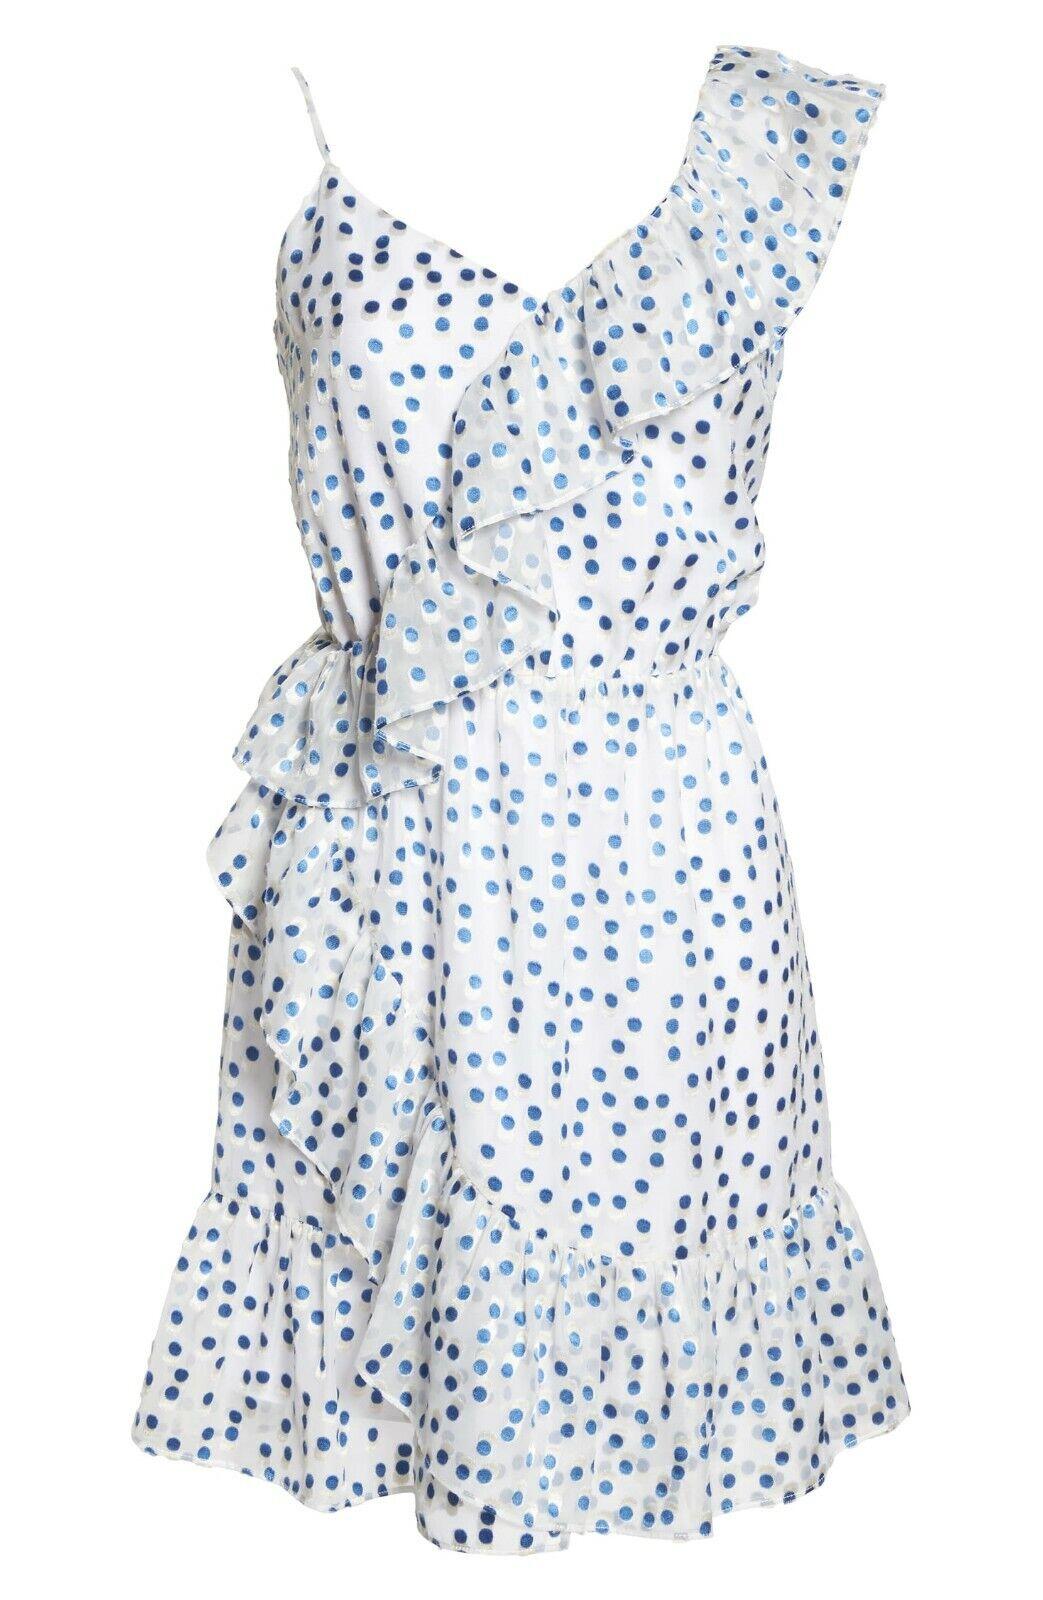 nyA Lilly Pulitzer XL Klättra Madelina blå vit Polka Dot Ruffle Slieveless